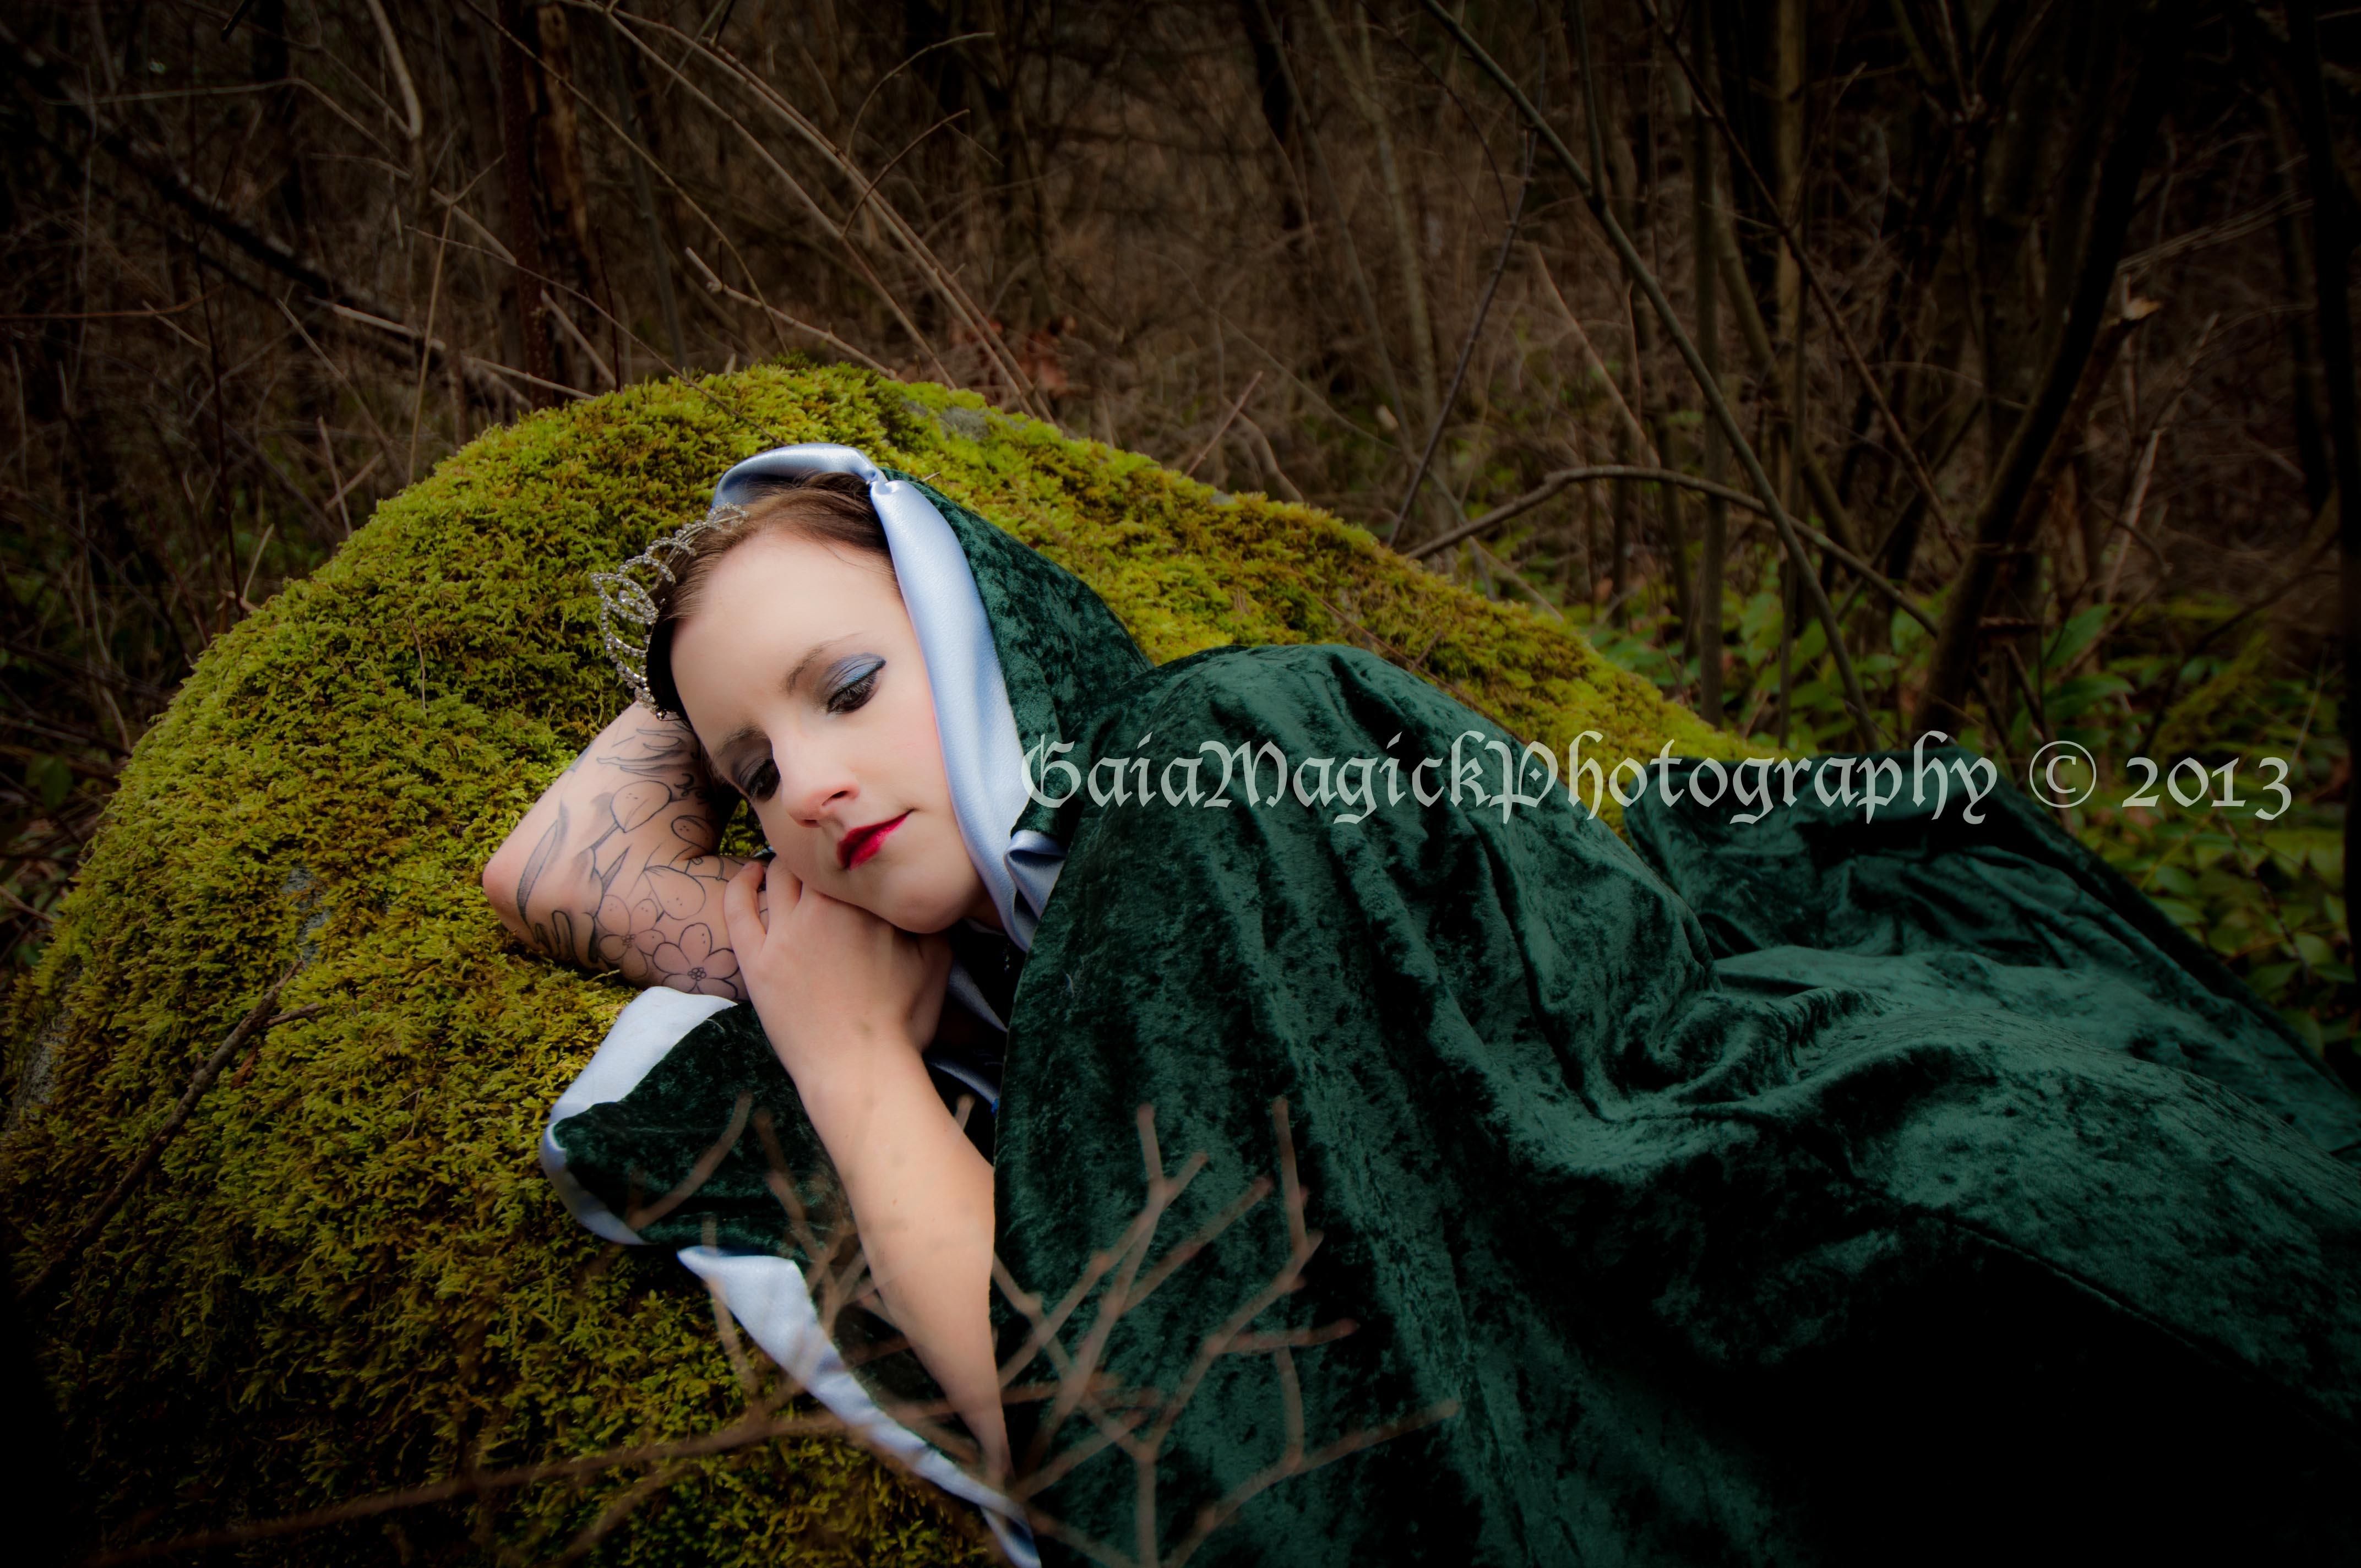 Sexy girls fun in the woods